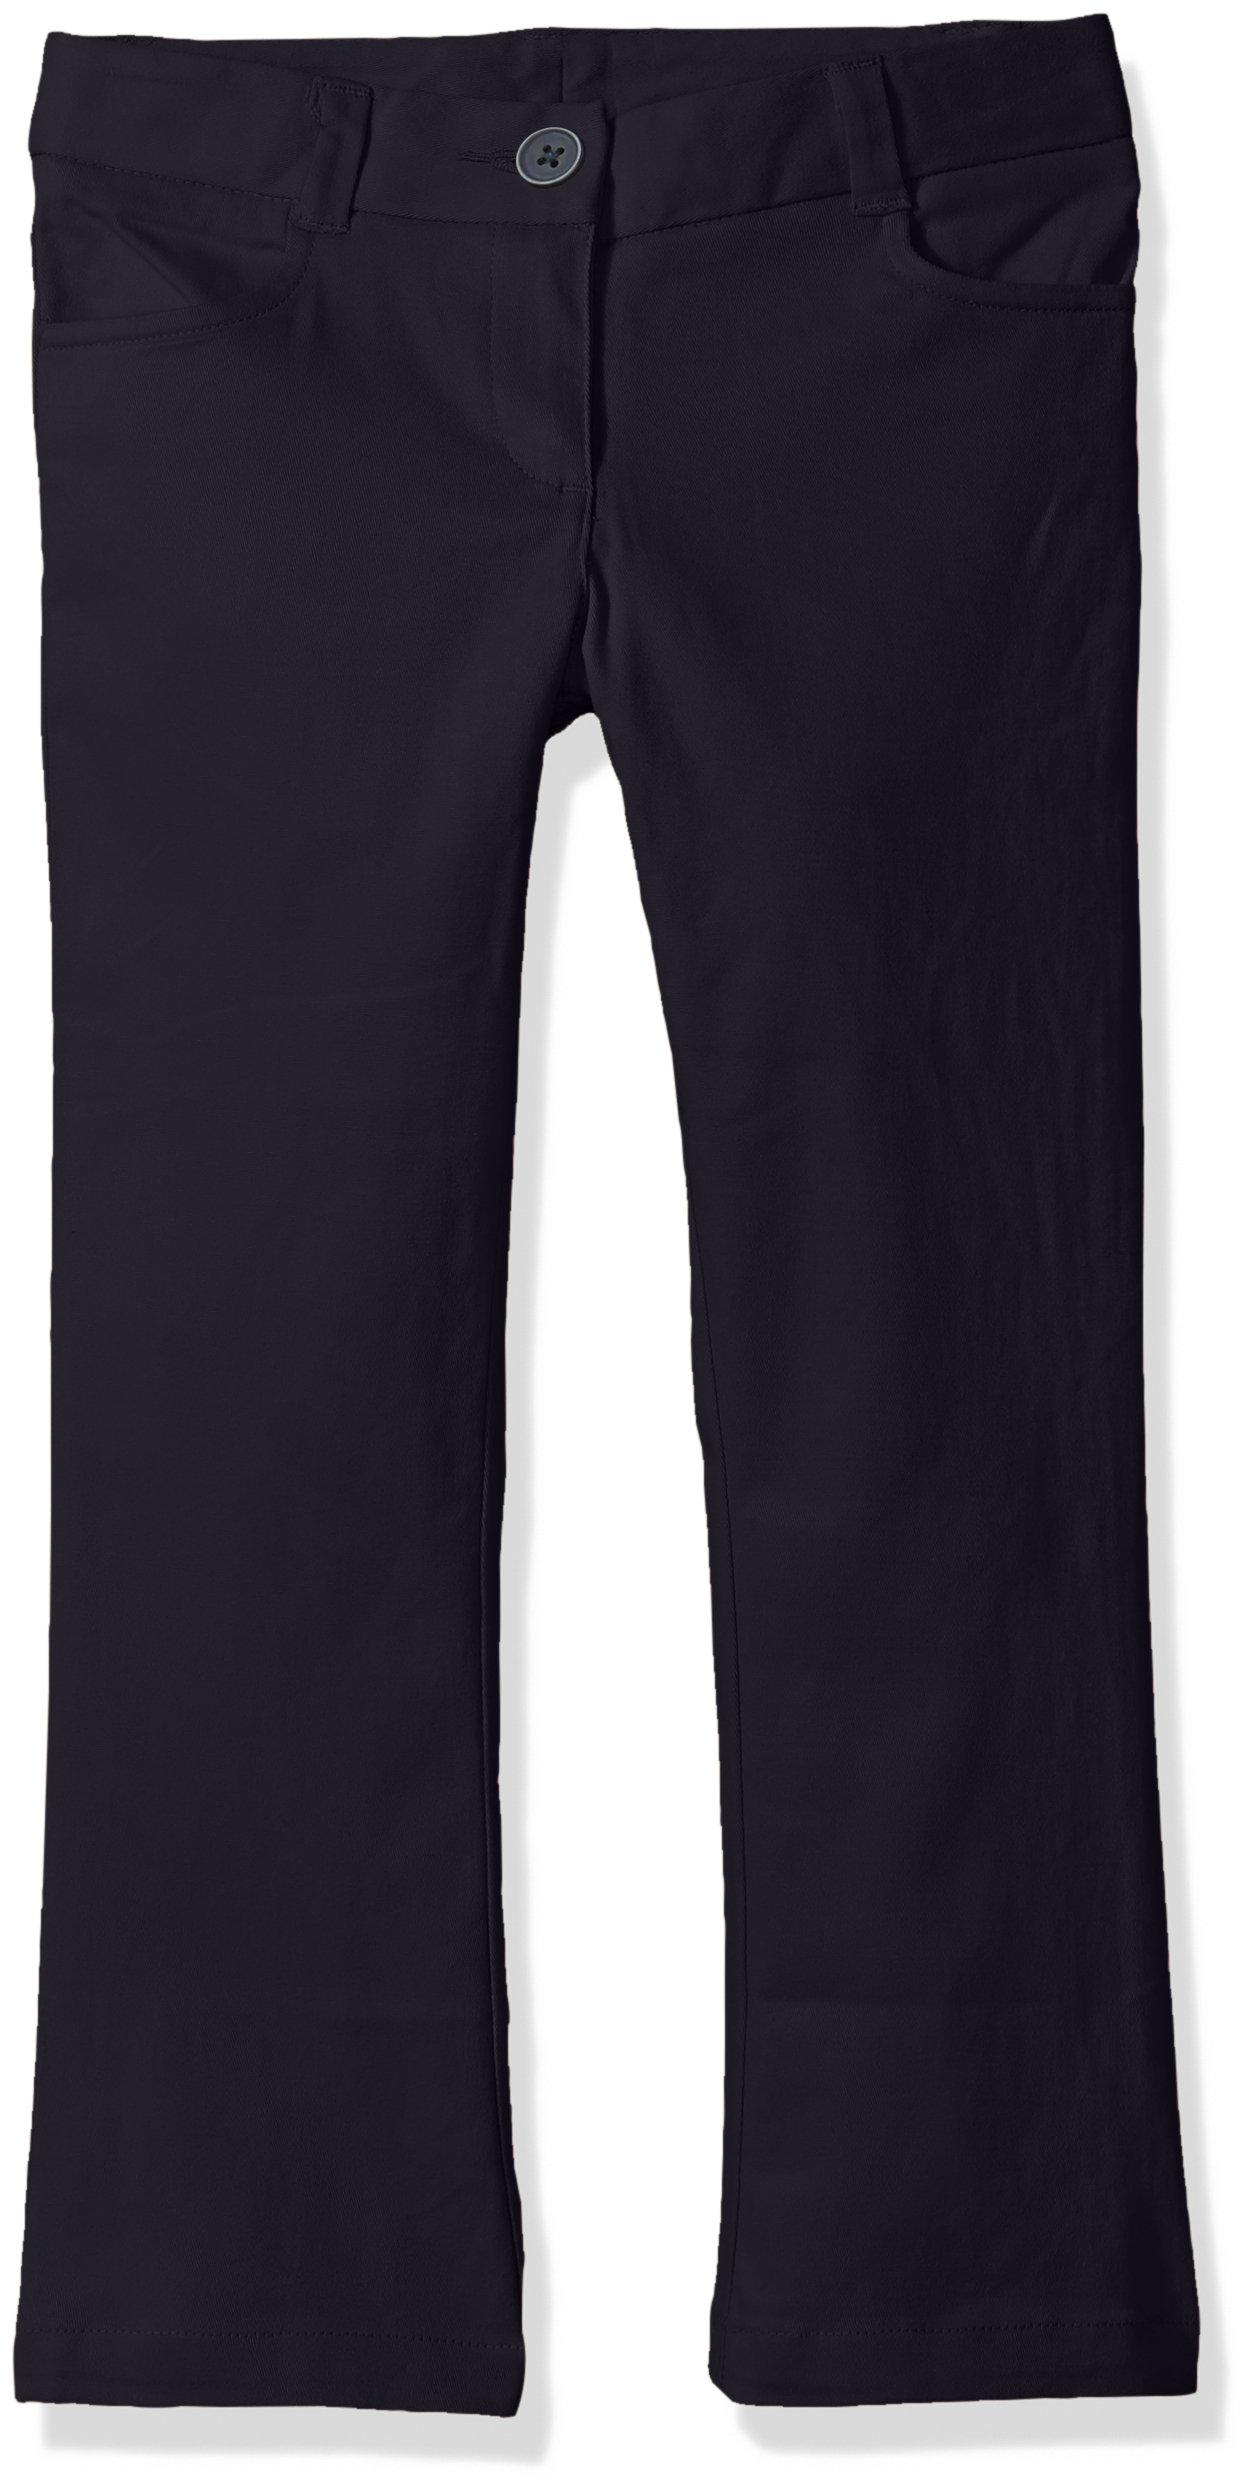 Nautica Little Girls' Uniform Bootcut Twill Pant, Navy, 6X